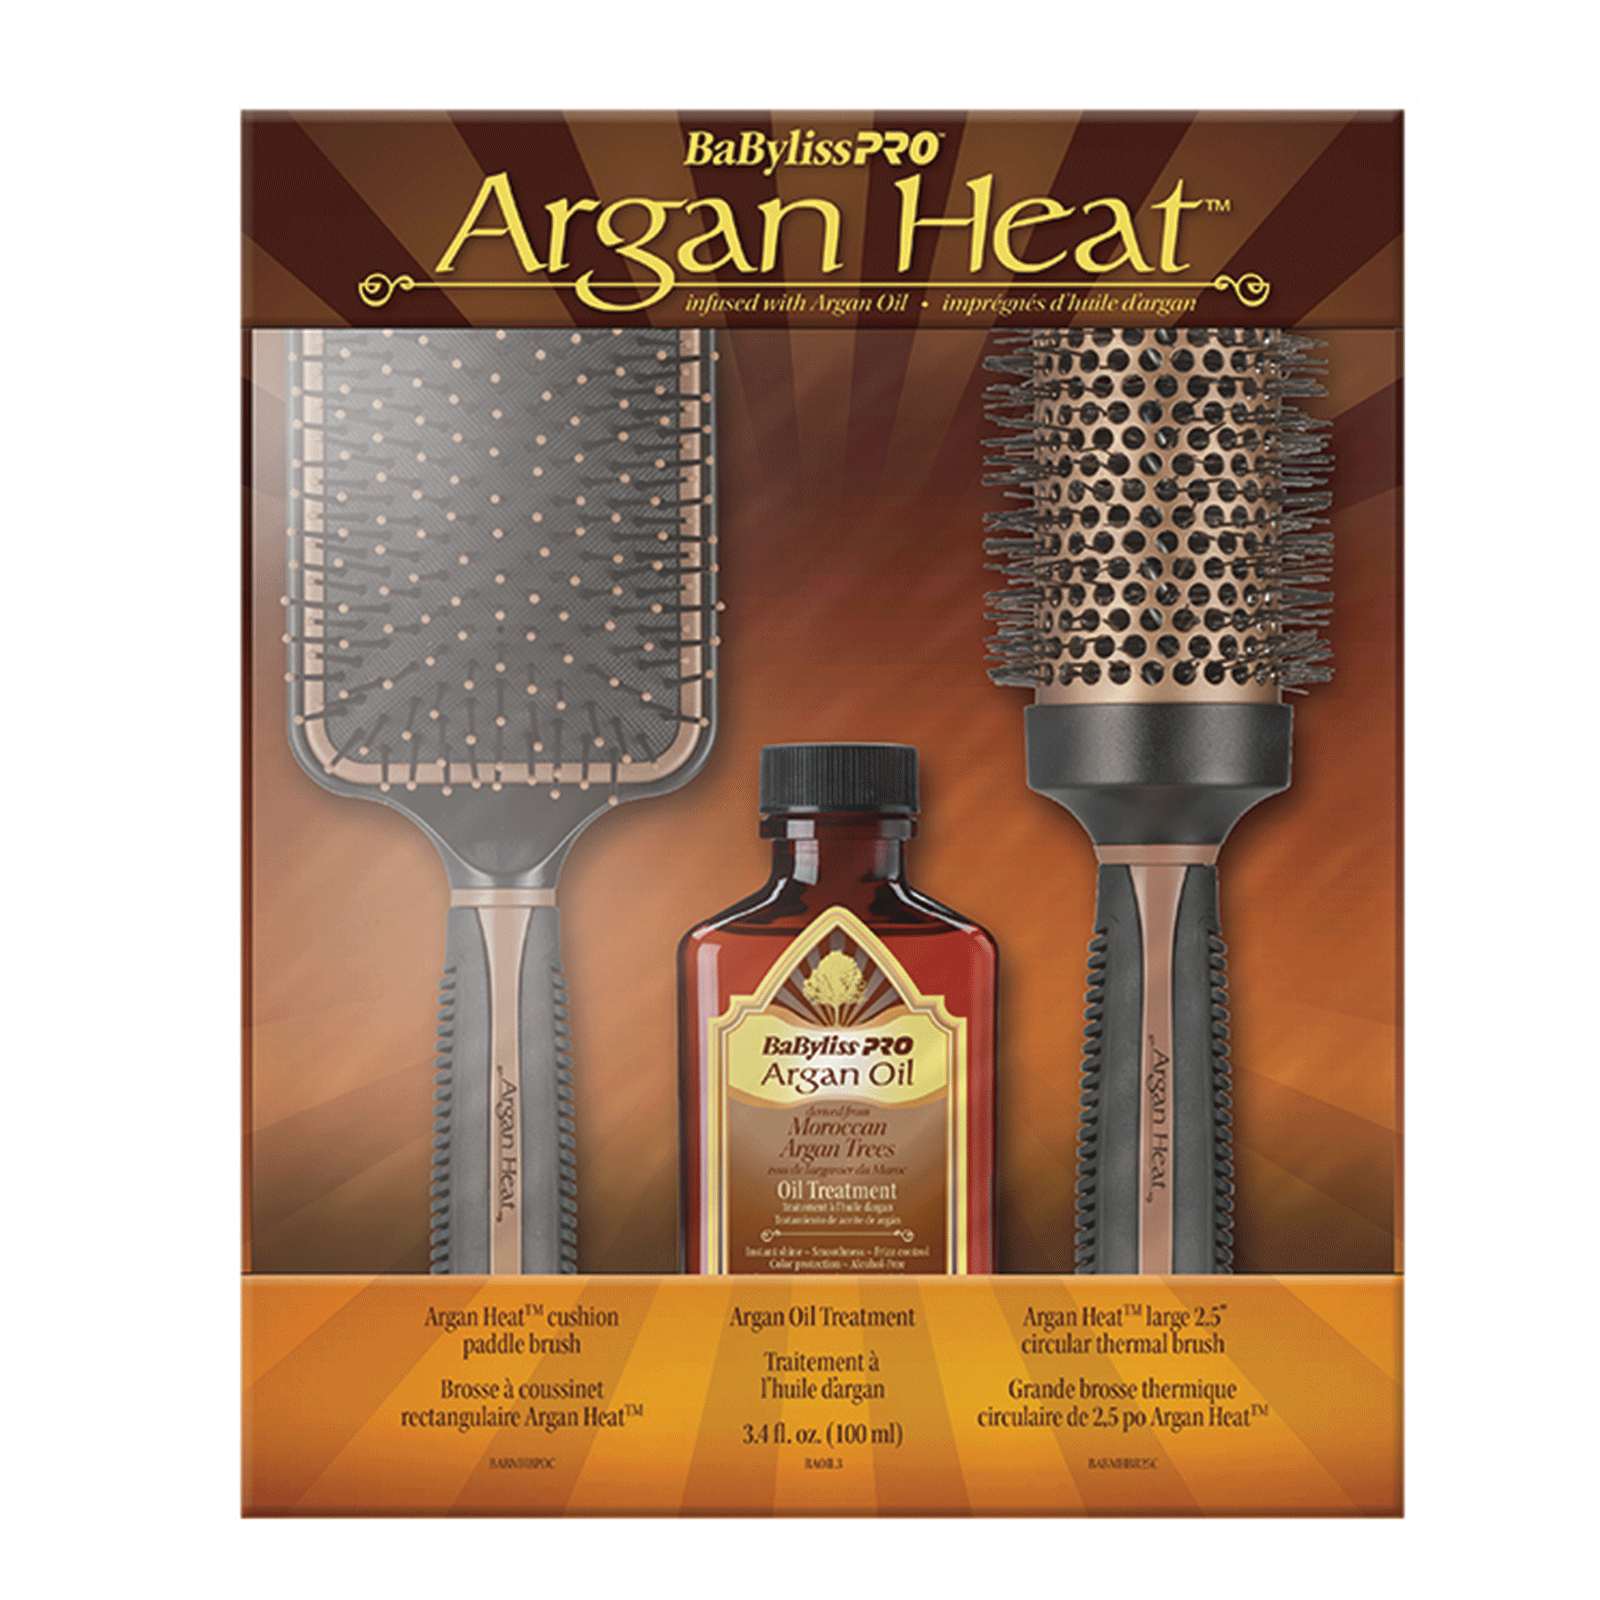 BaByliss Pro Argan Heat Paddle Brush, Thermal Brush & Oil Set * Select product